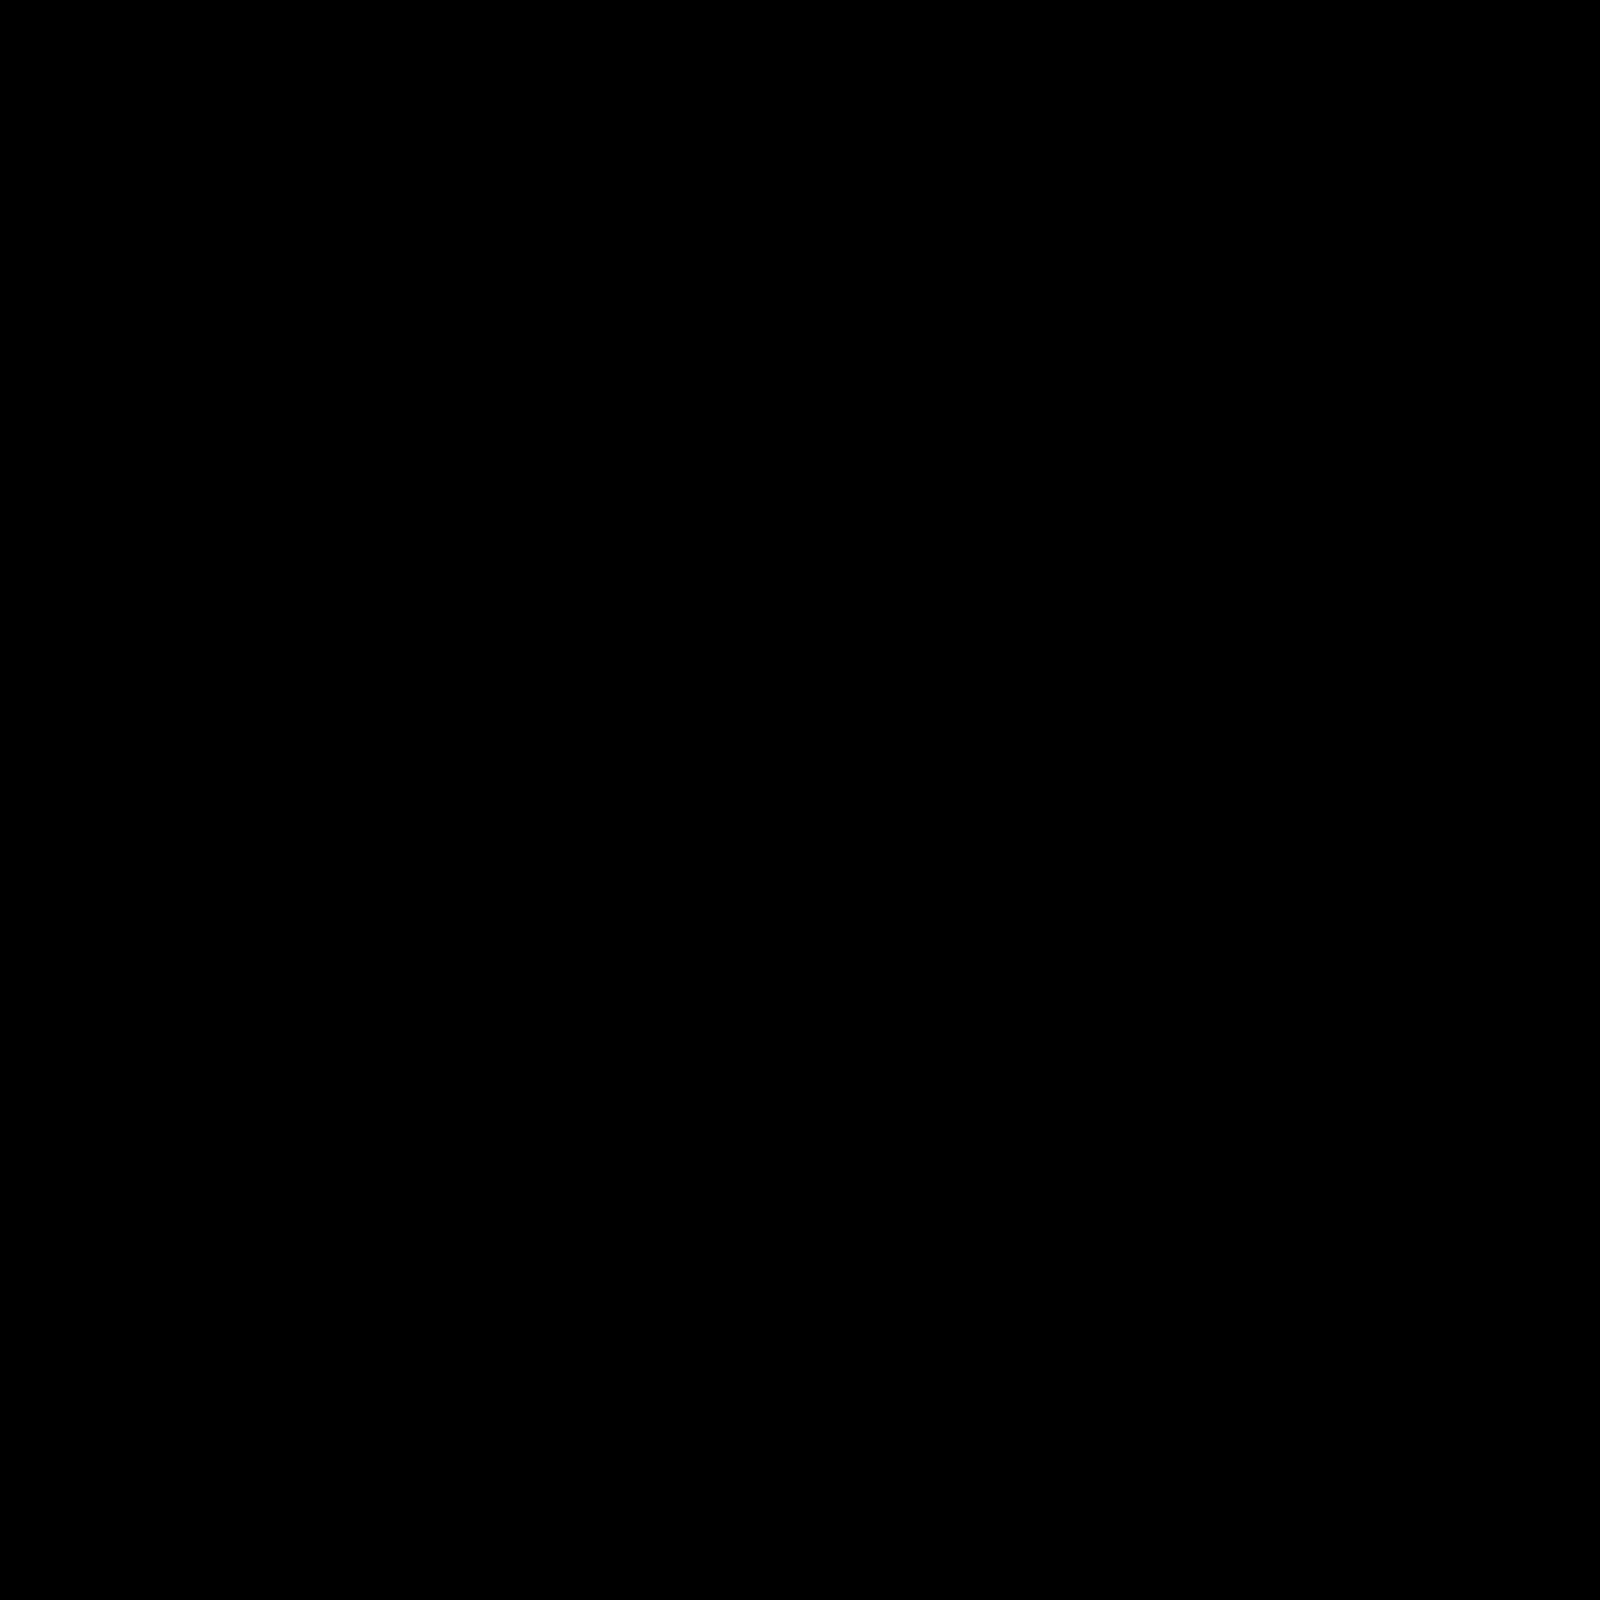 Slender Man icon